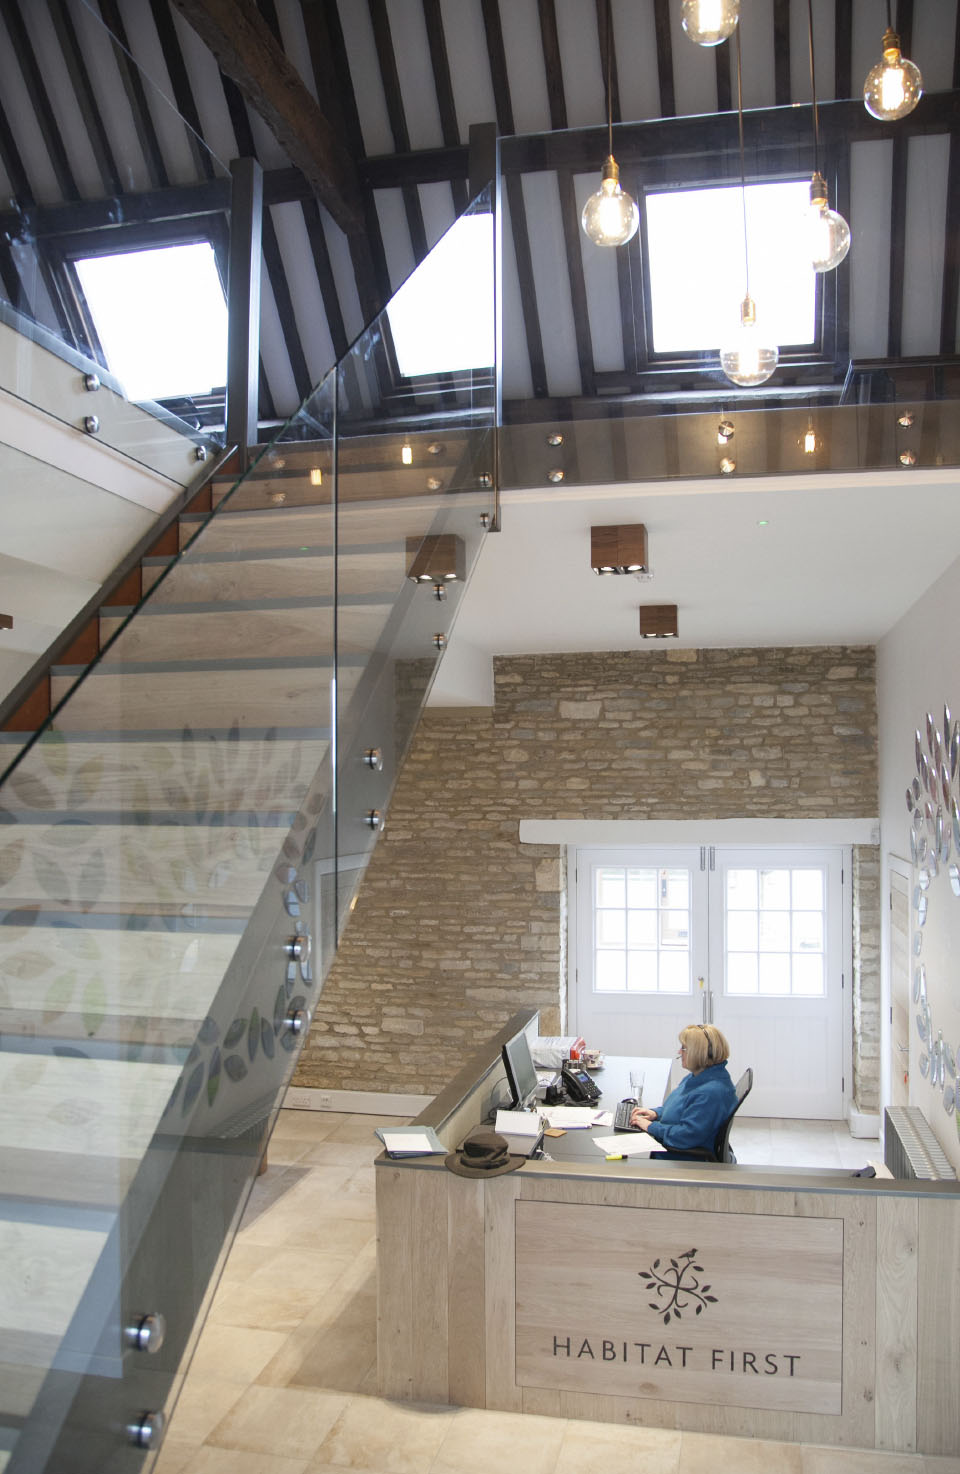 Habitat-First-Interior-Reception-design